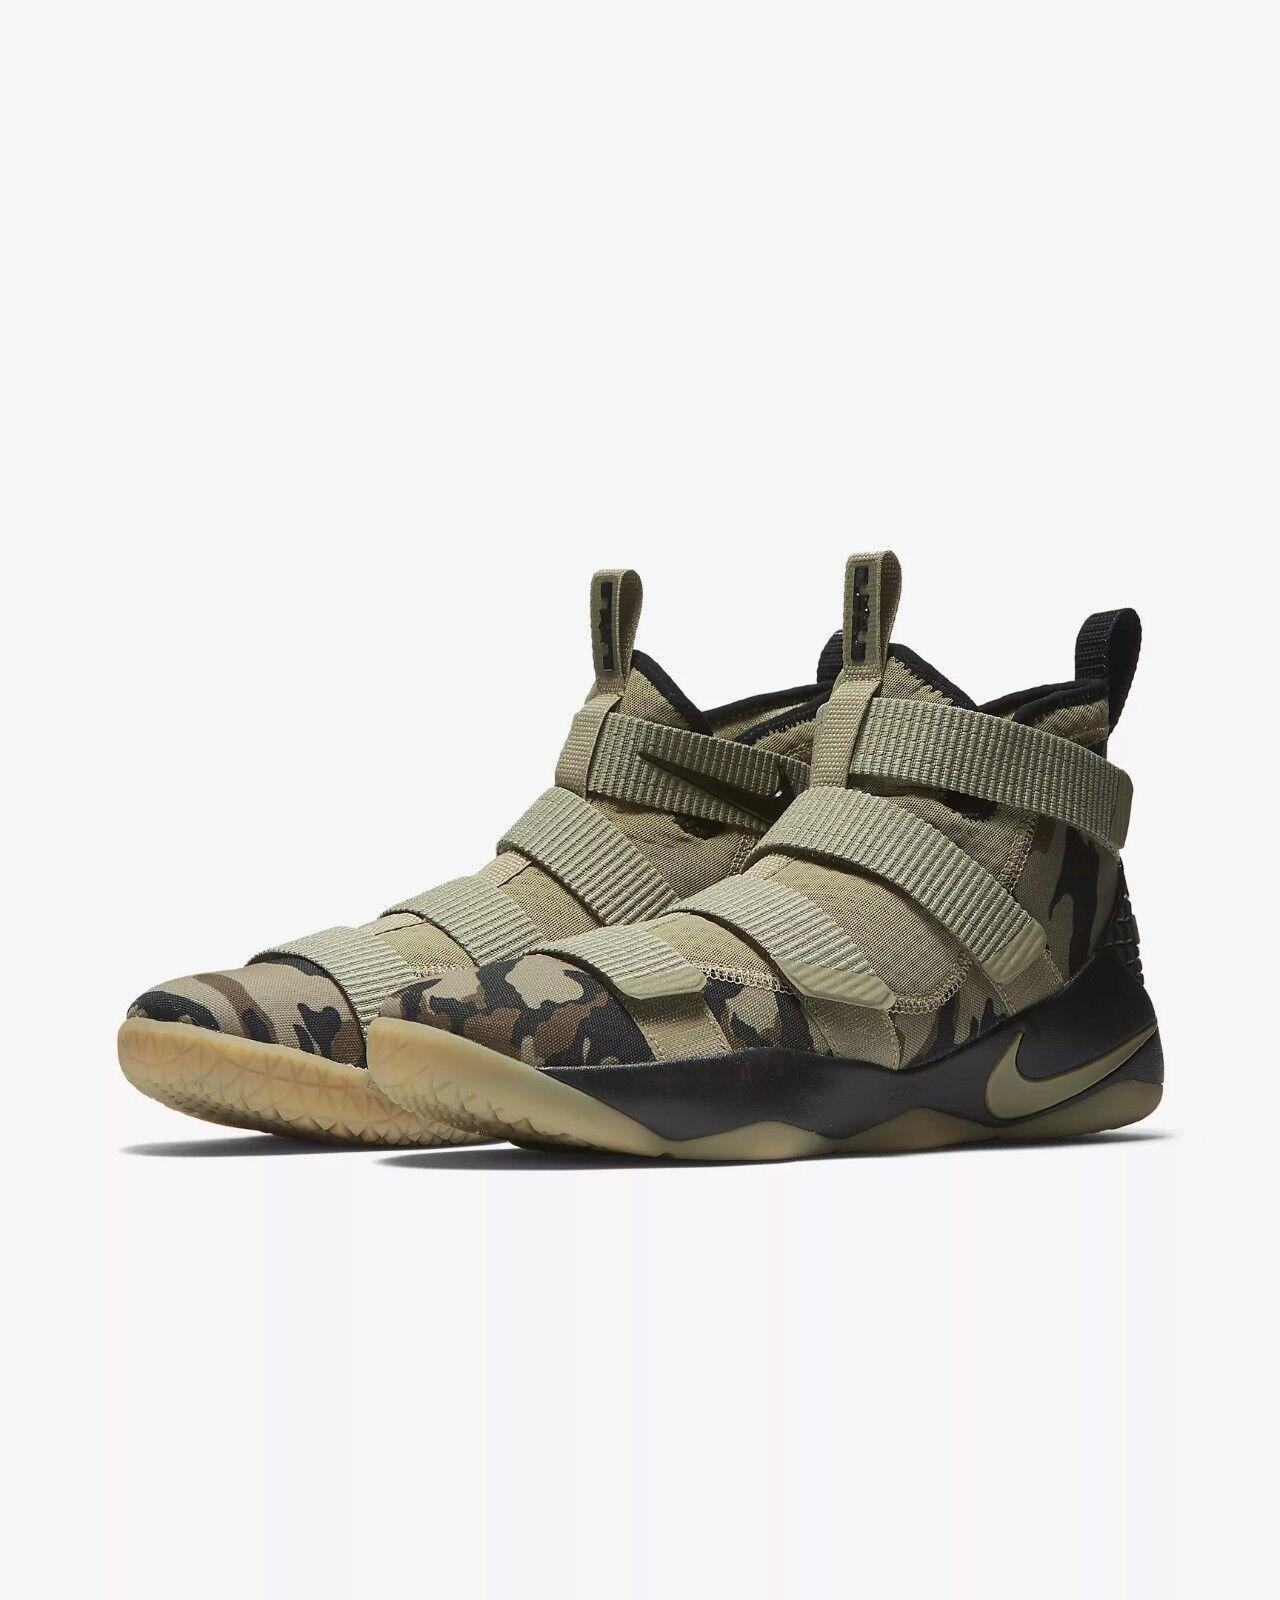 897644-200 Nike Lebron Soldier XI Basketball Olive Hazel-Sequoia Größes 8-13 NIB